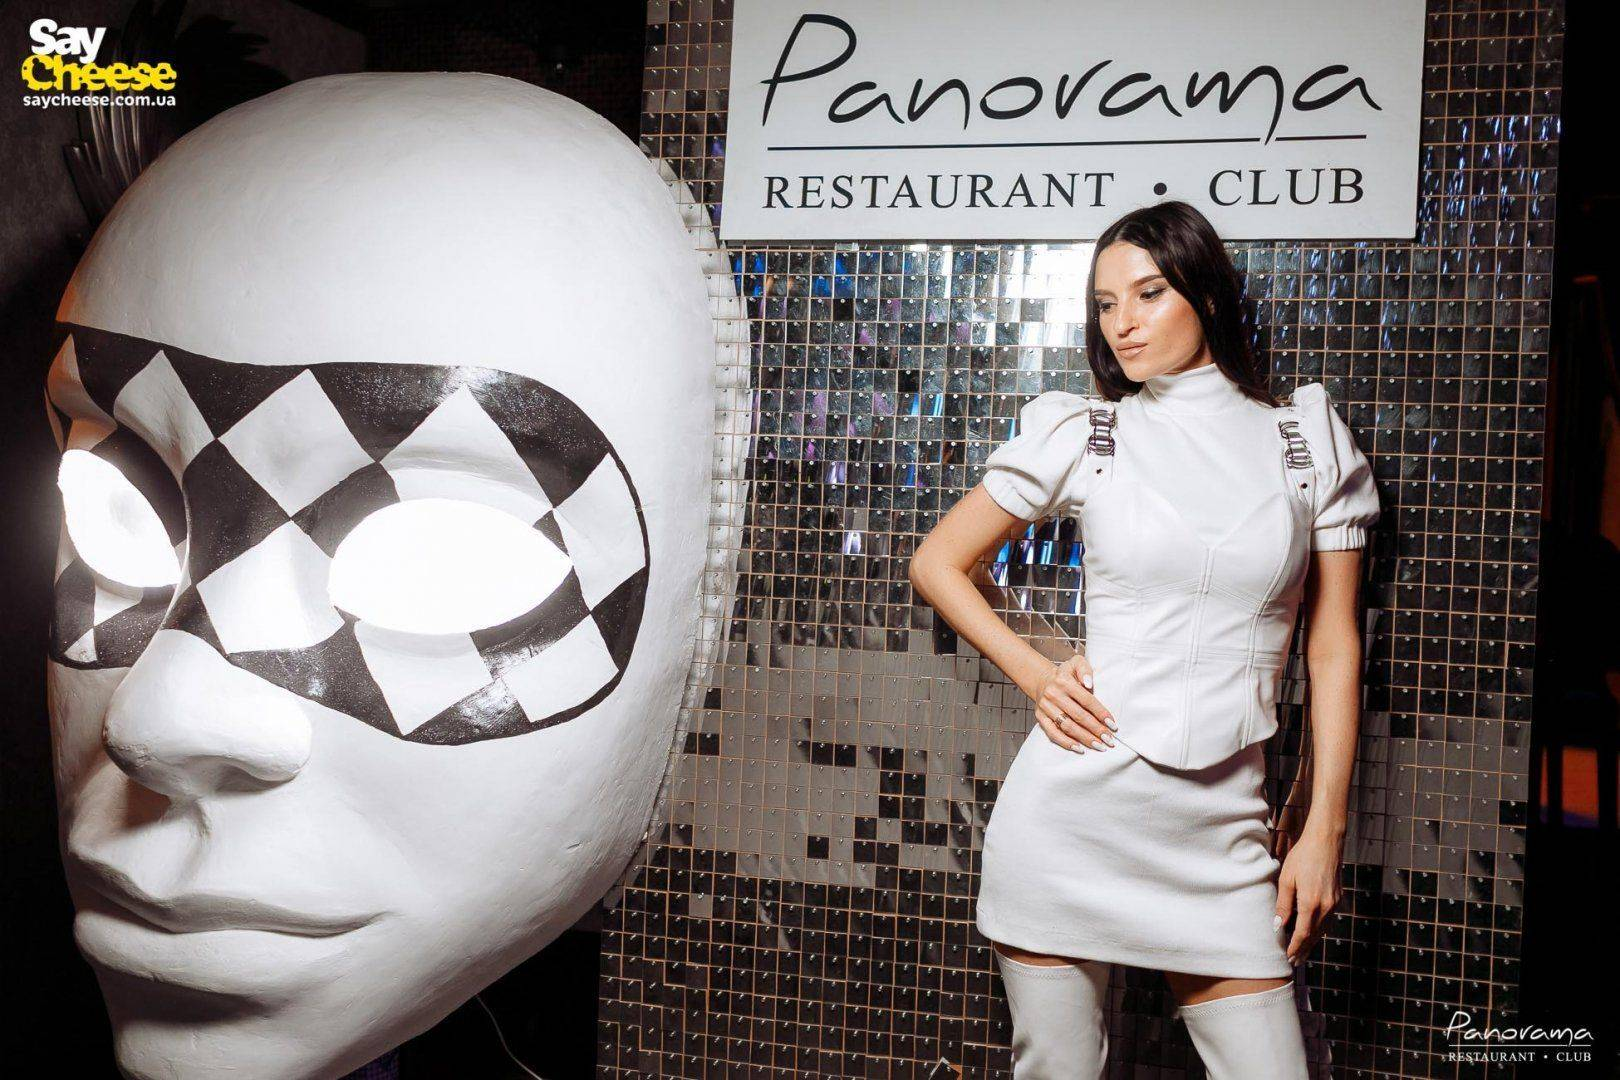 Ресторан Панорама Харьков фотоотчет Saycheese 2.01